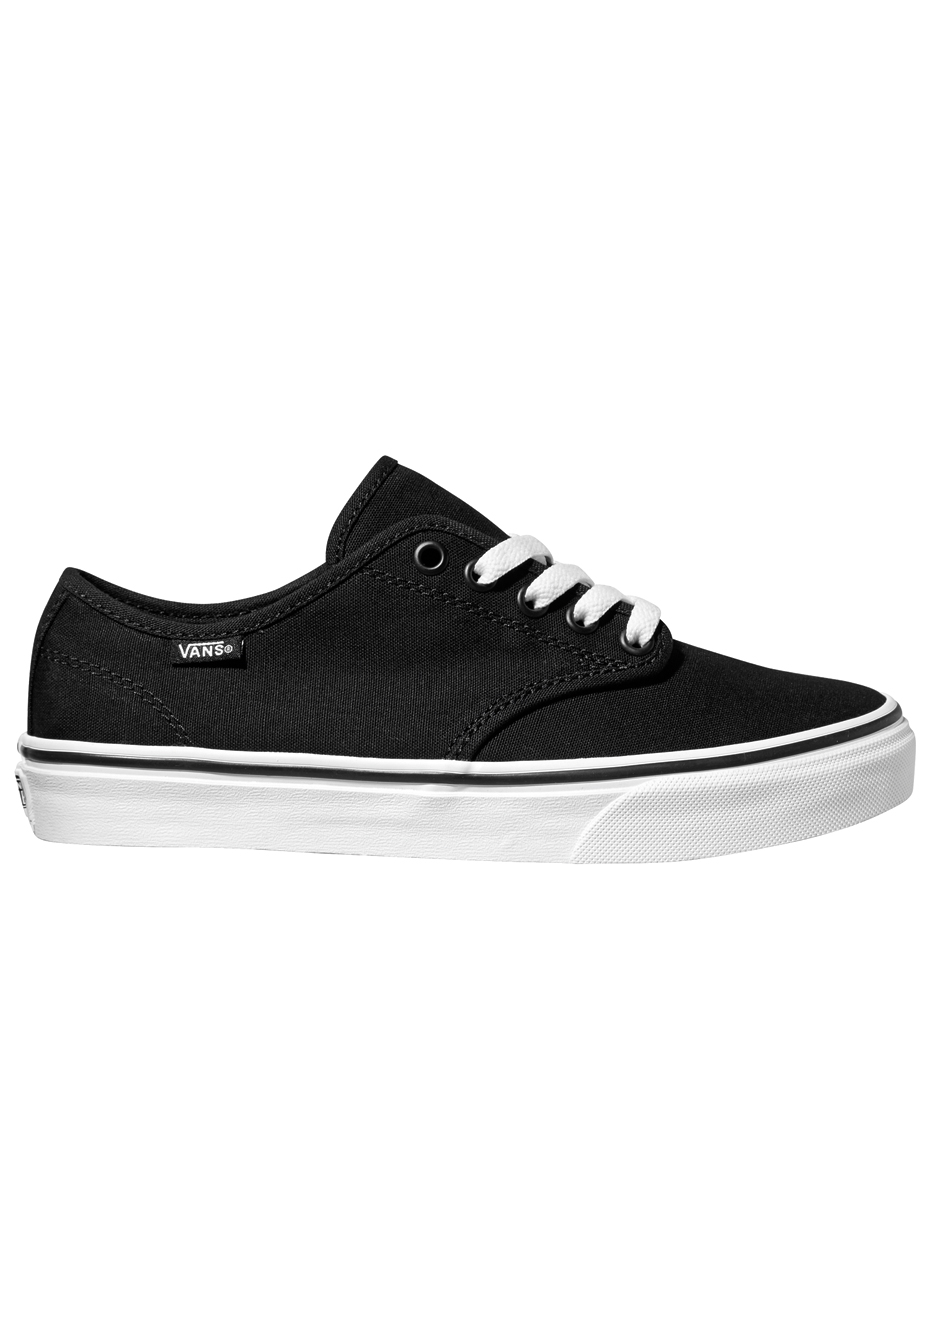 Vans - Womens - Camden Stripe Black